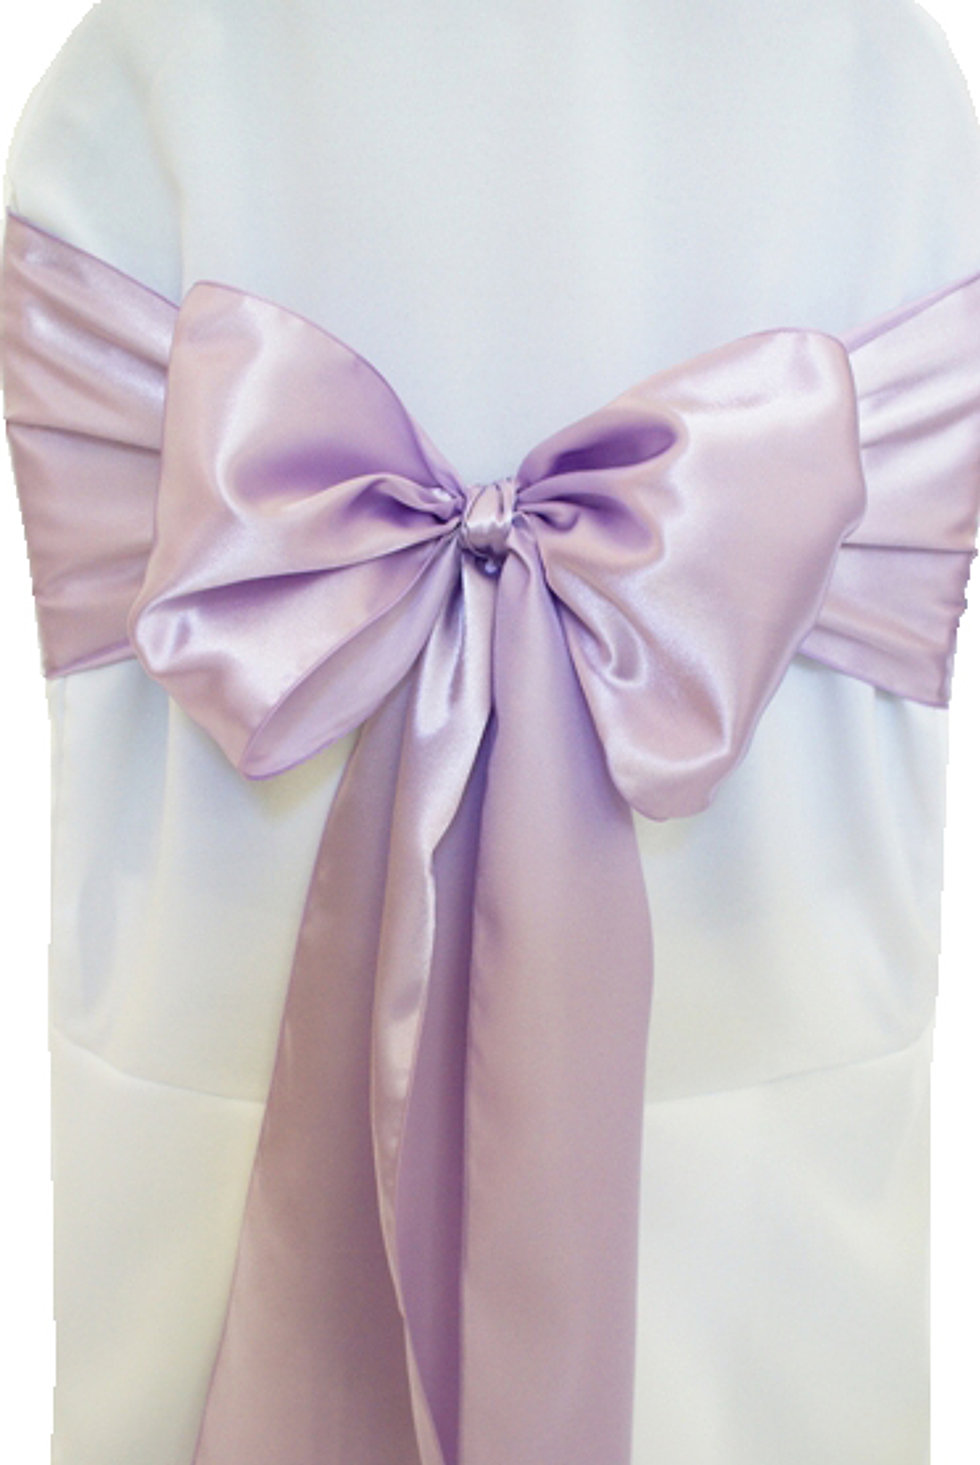 Satin Lavender Chair Sash